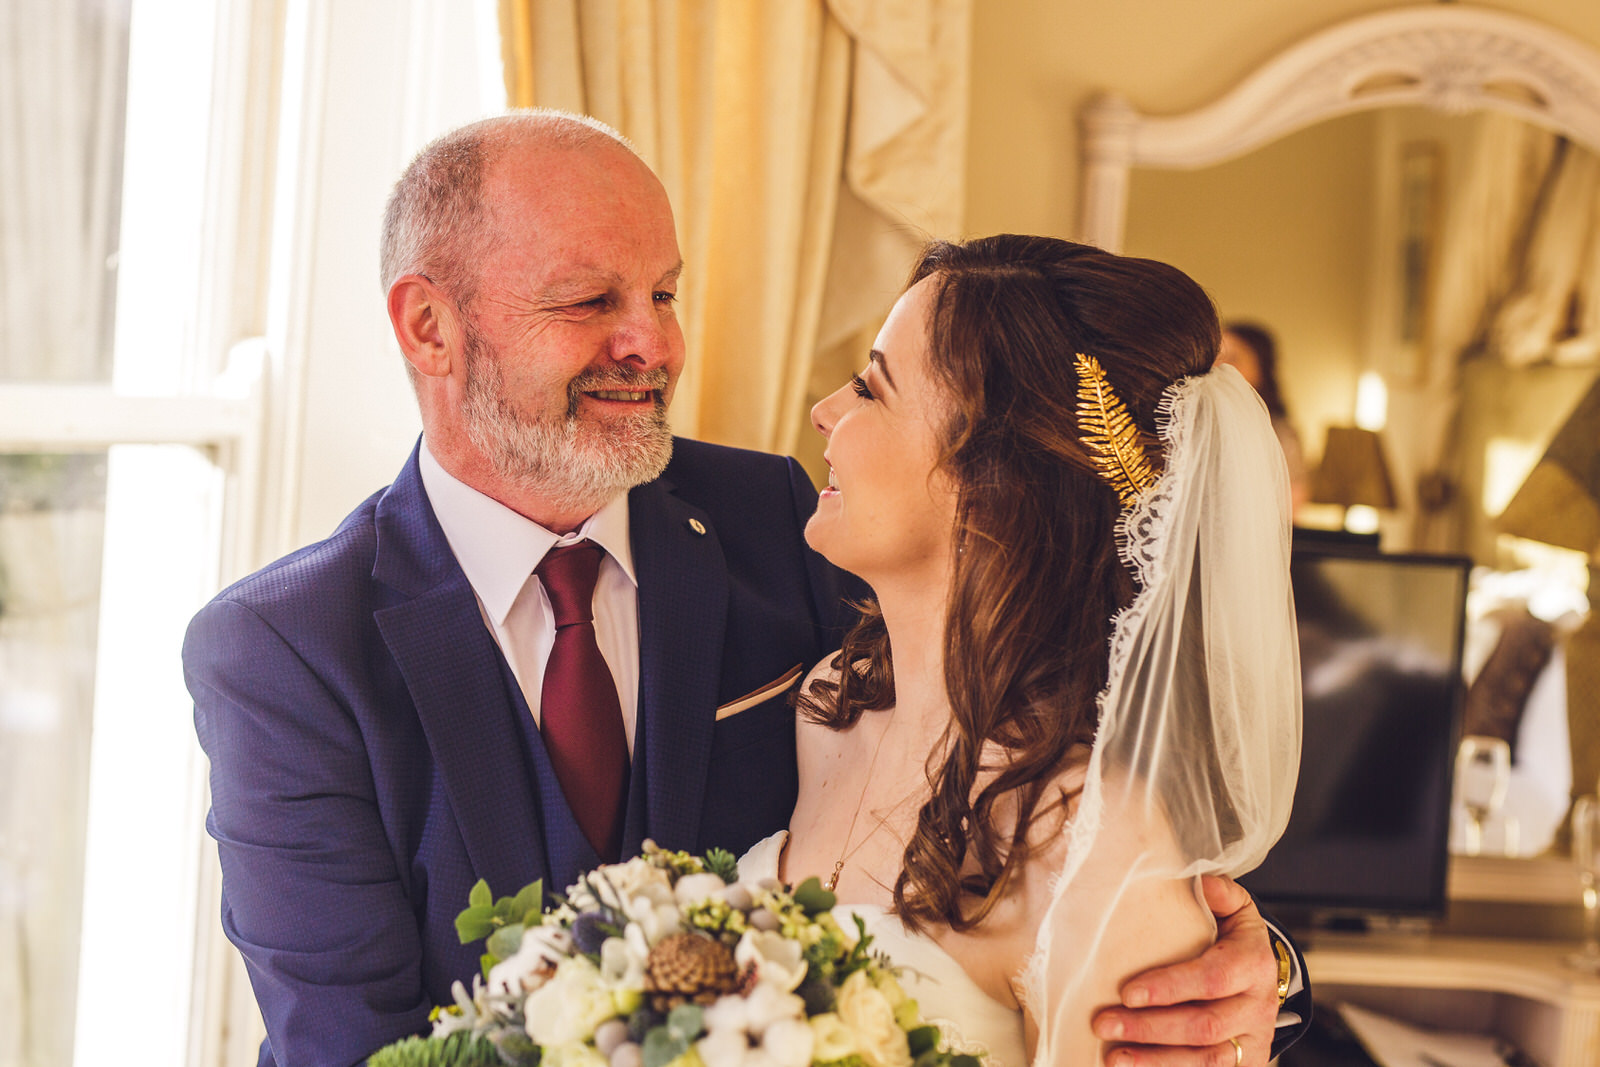 Roger-kenny-wedding-photographer-greystones-wicklow-dublin_029.jpg